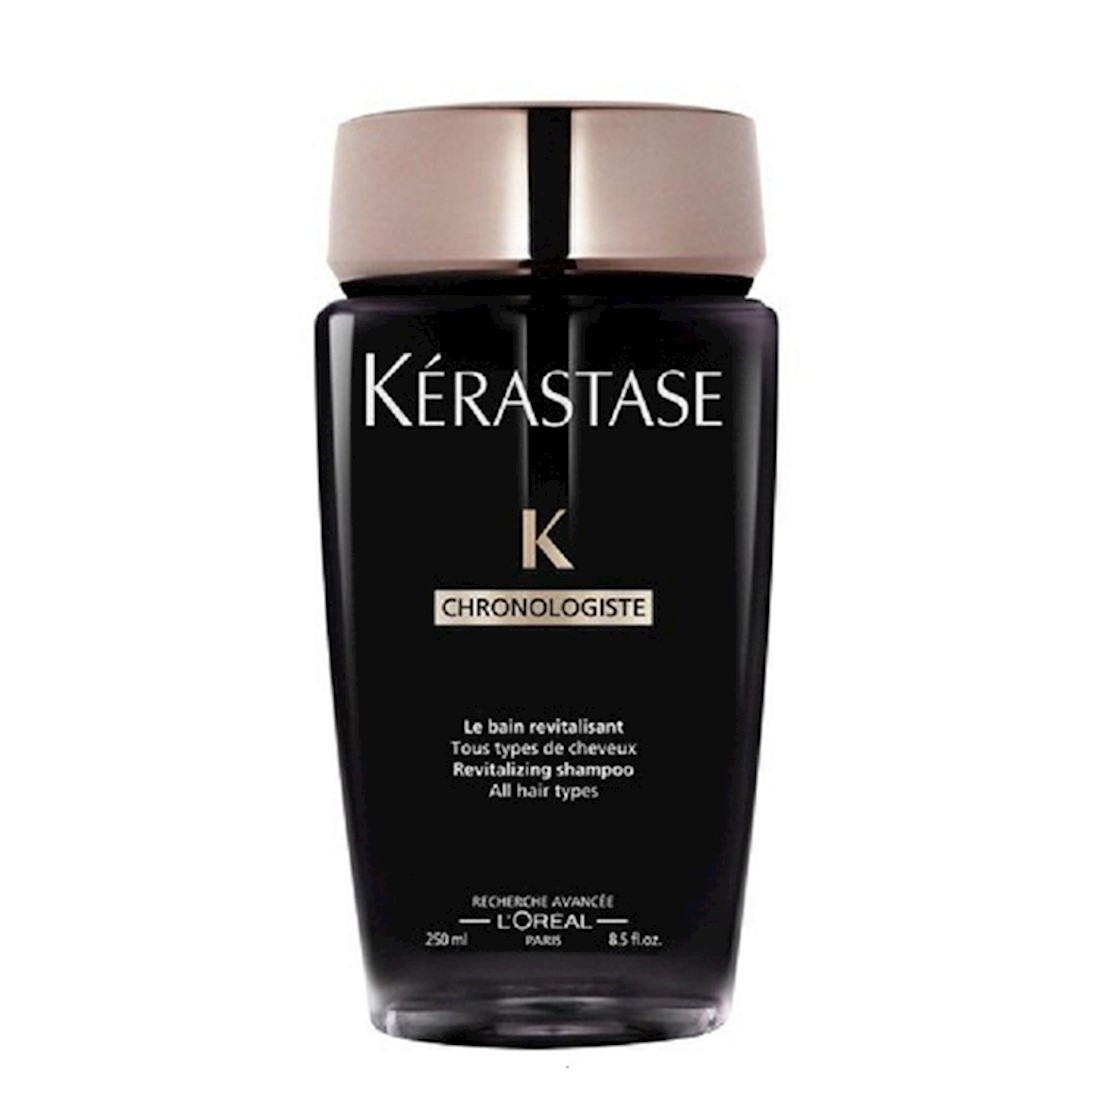 Kérastase Chronologiste Bain Revitalisant - Shampoo 250ml - CA